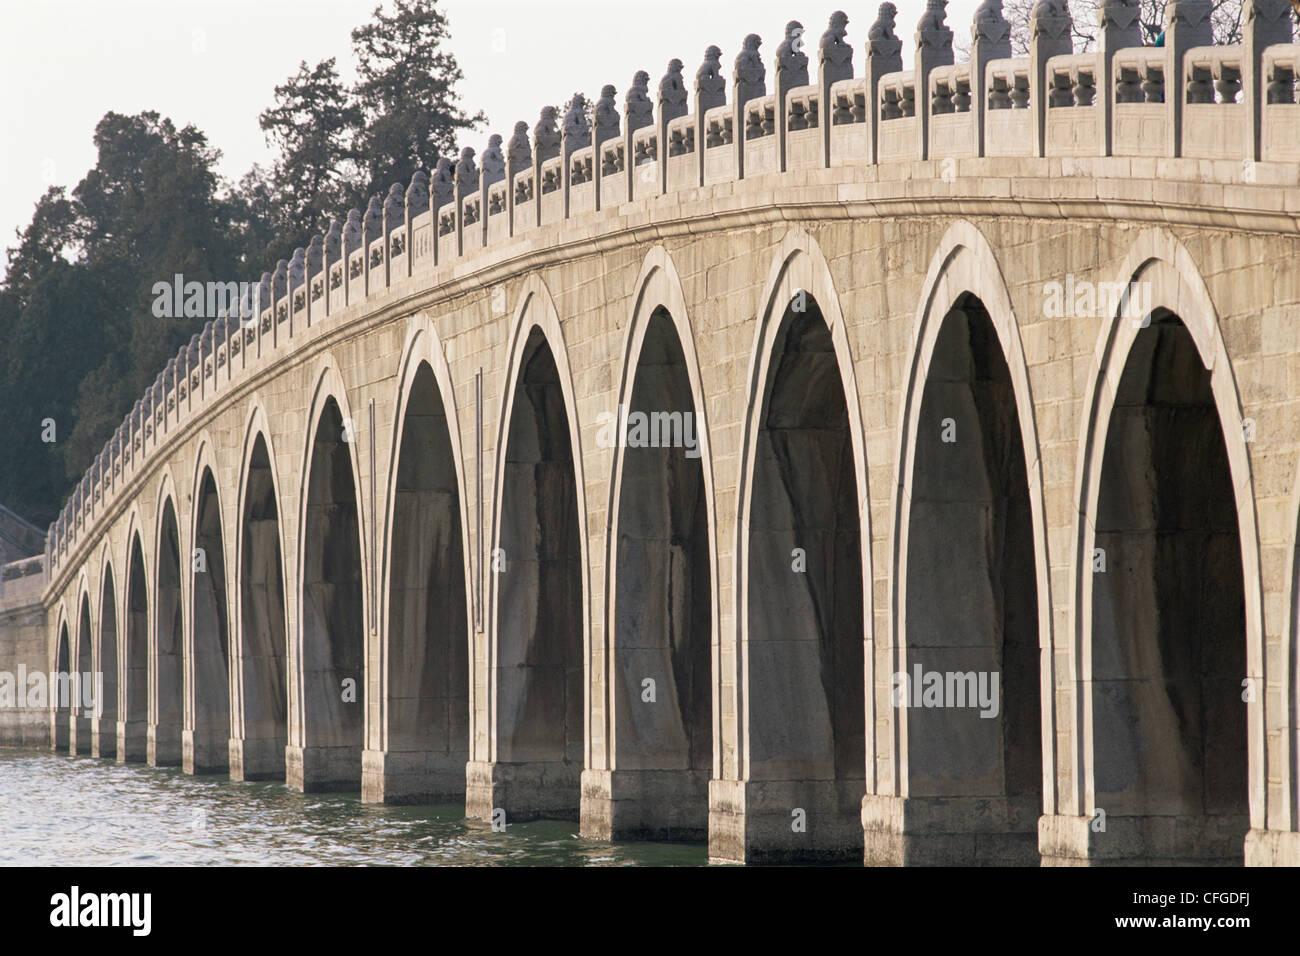 China, Beijing, Summer Palace, Seventeen Arched Bridge - Stock Image